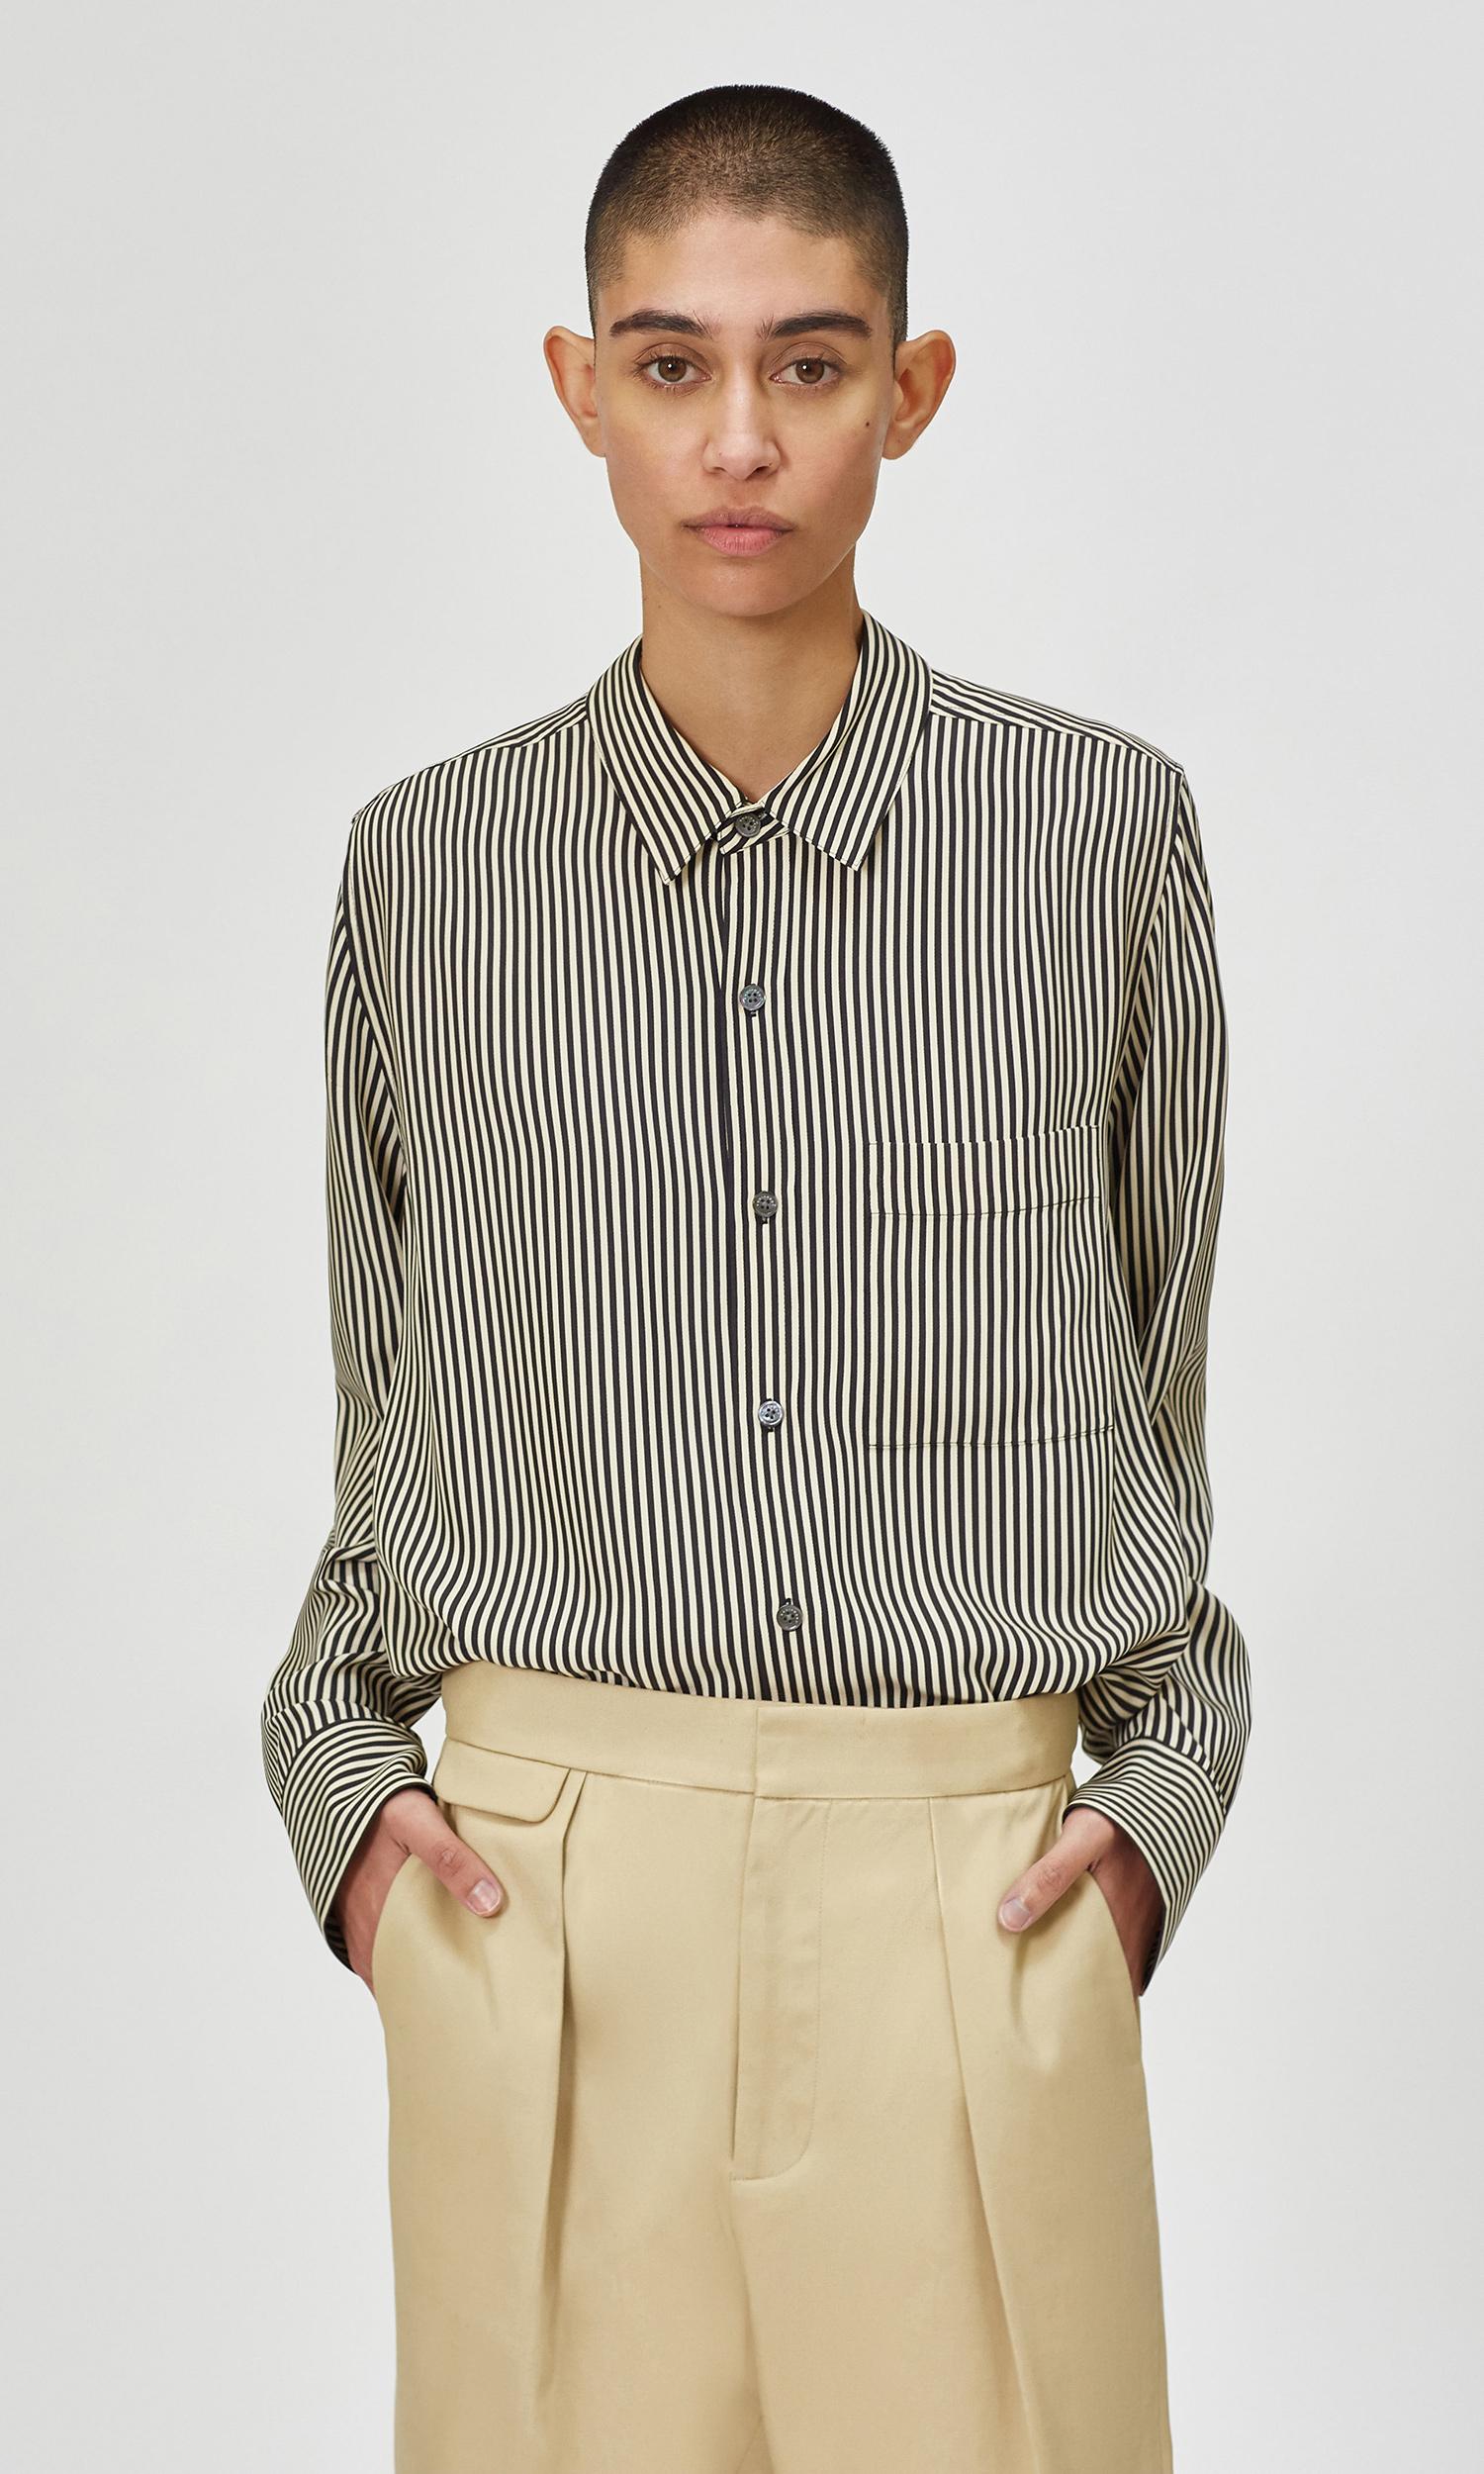 Slim Fit Shirt by Equipment